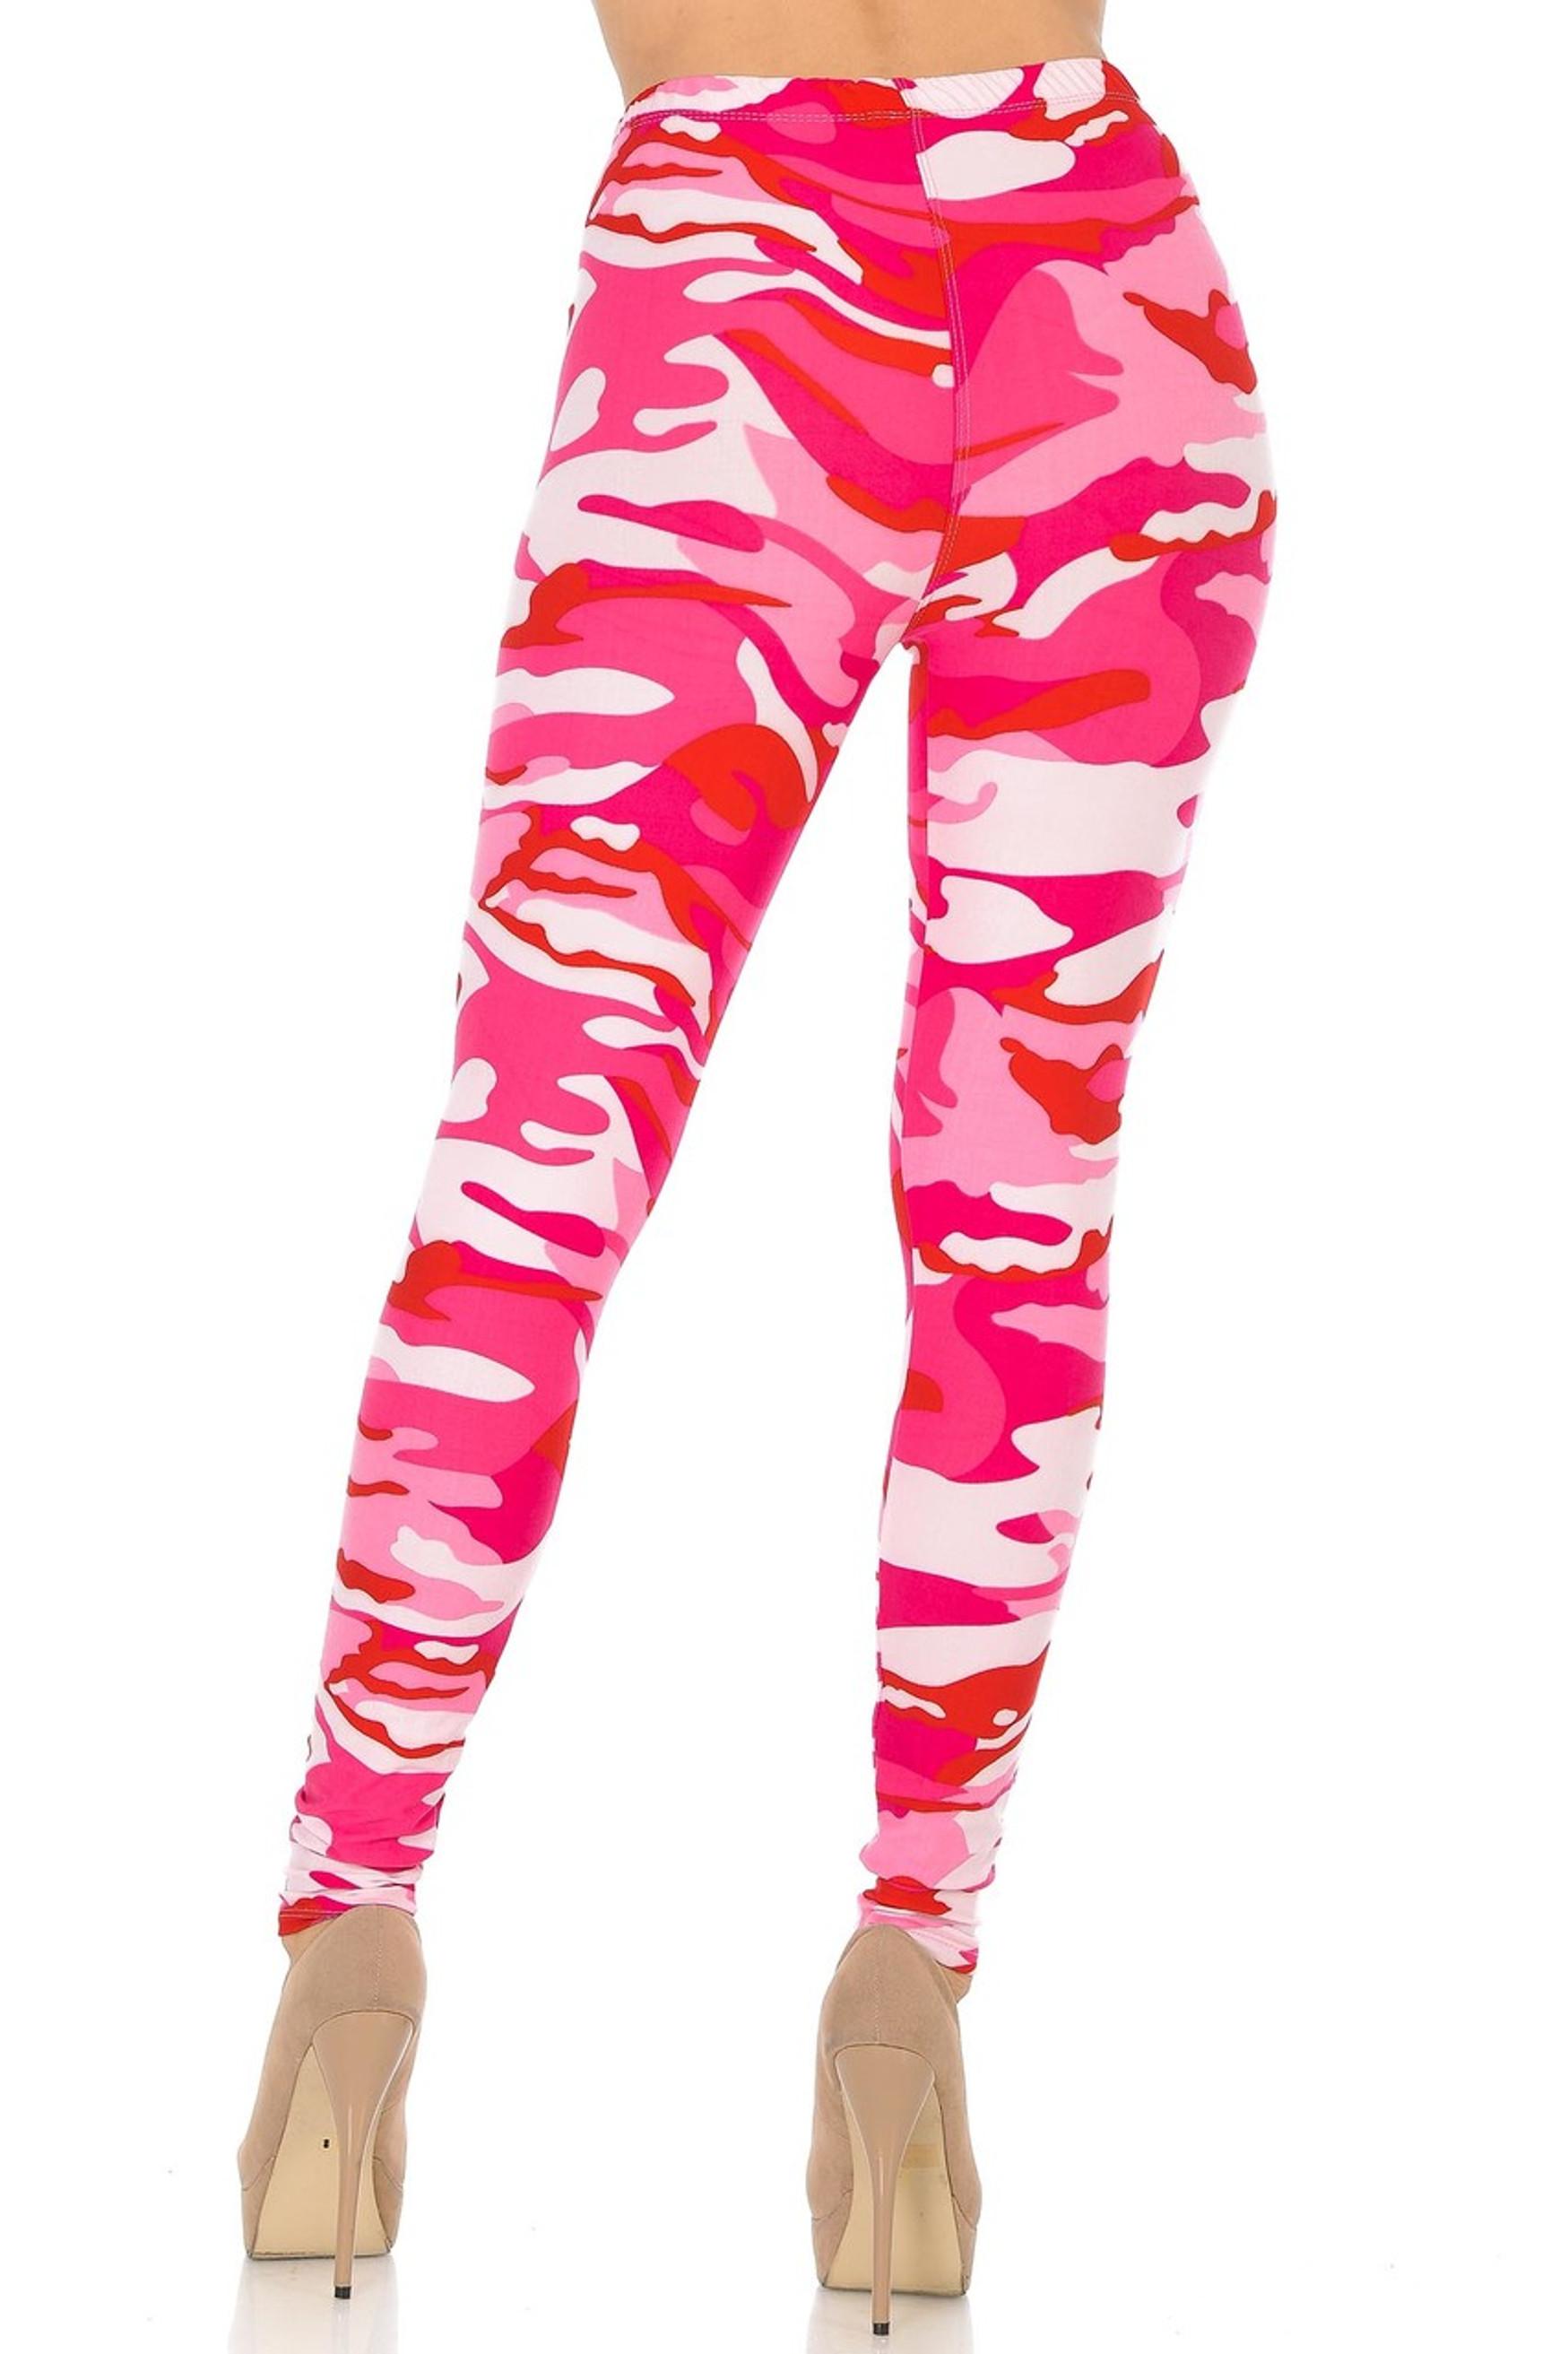 Brushed Pink Camouflage Leggings